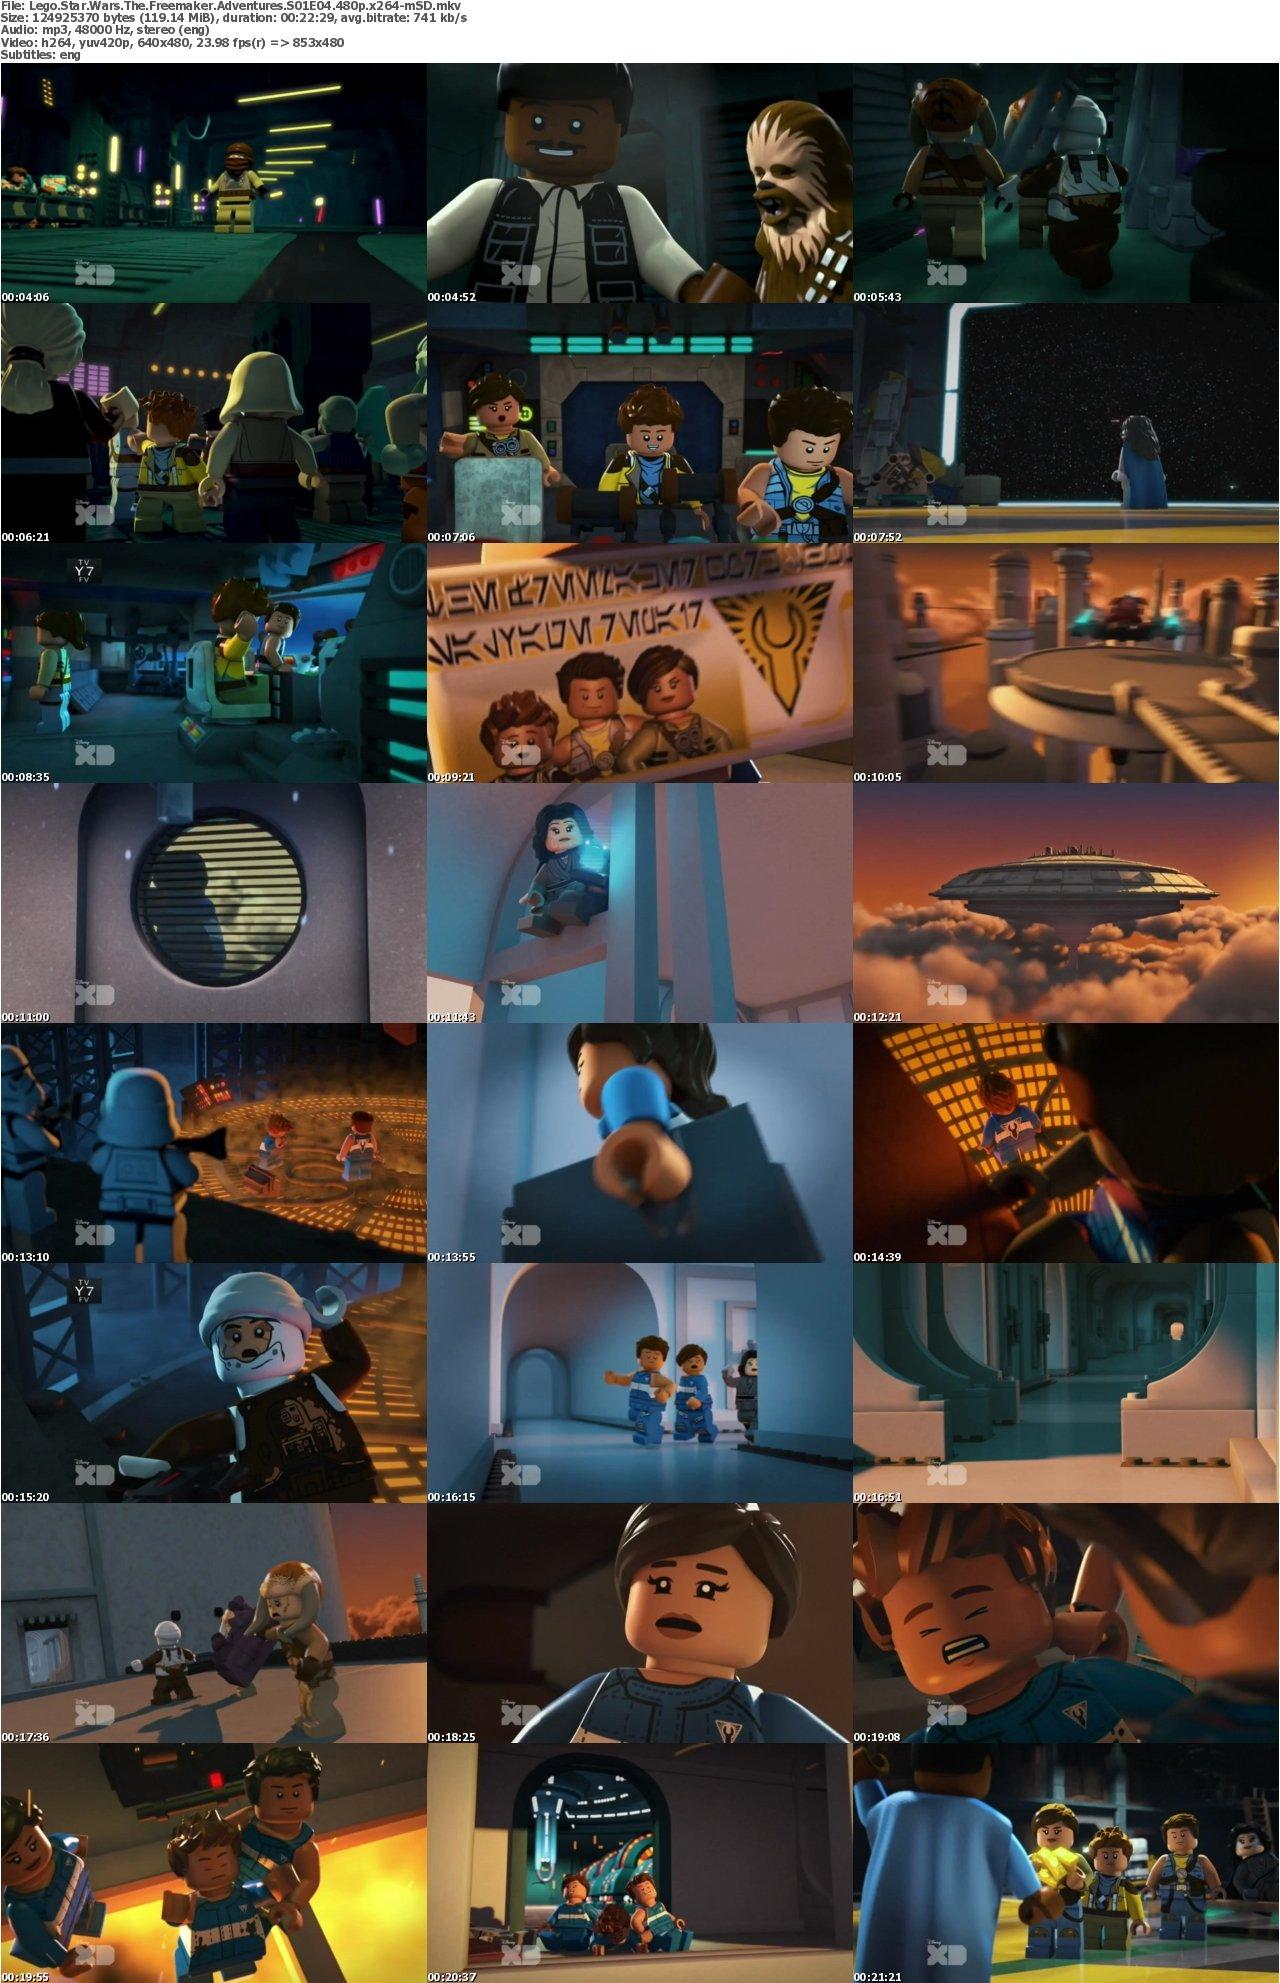 download lego star wars the freemaker adventures s01e04